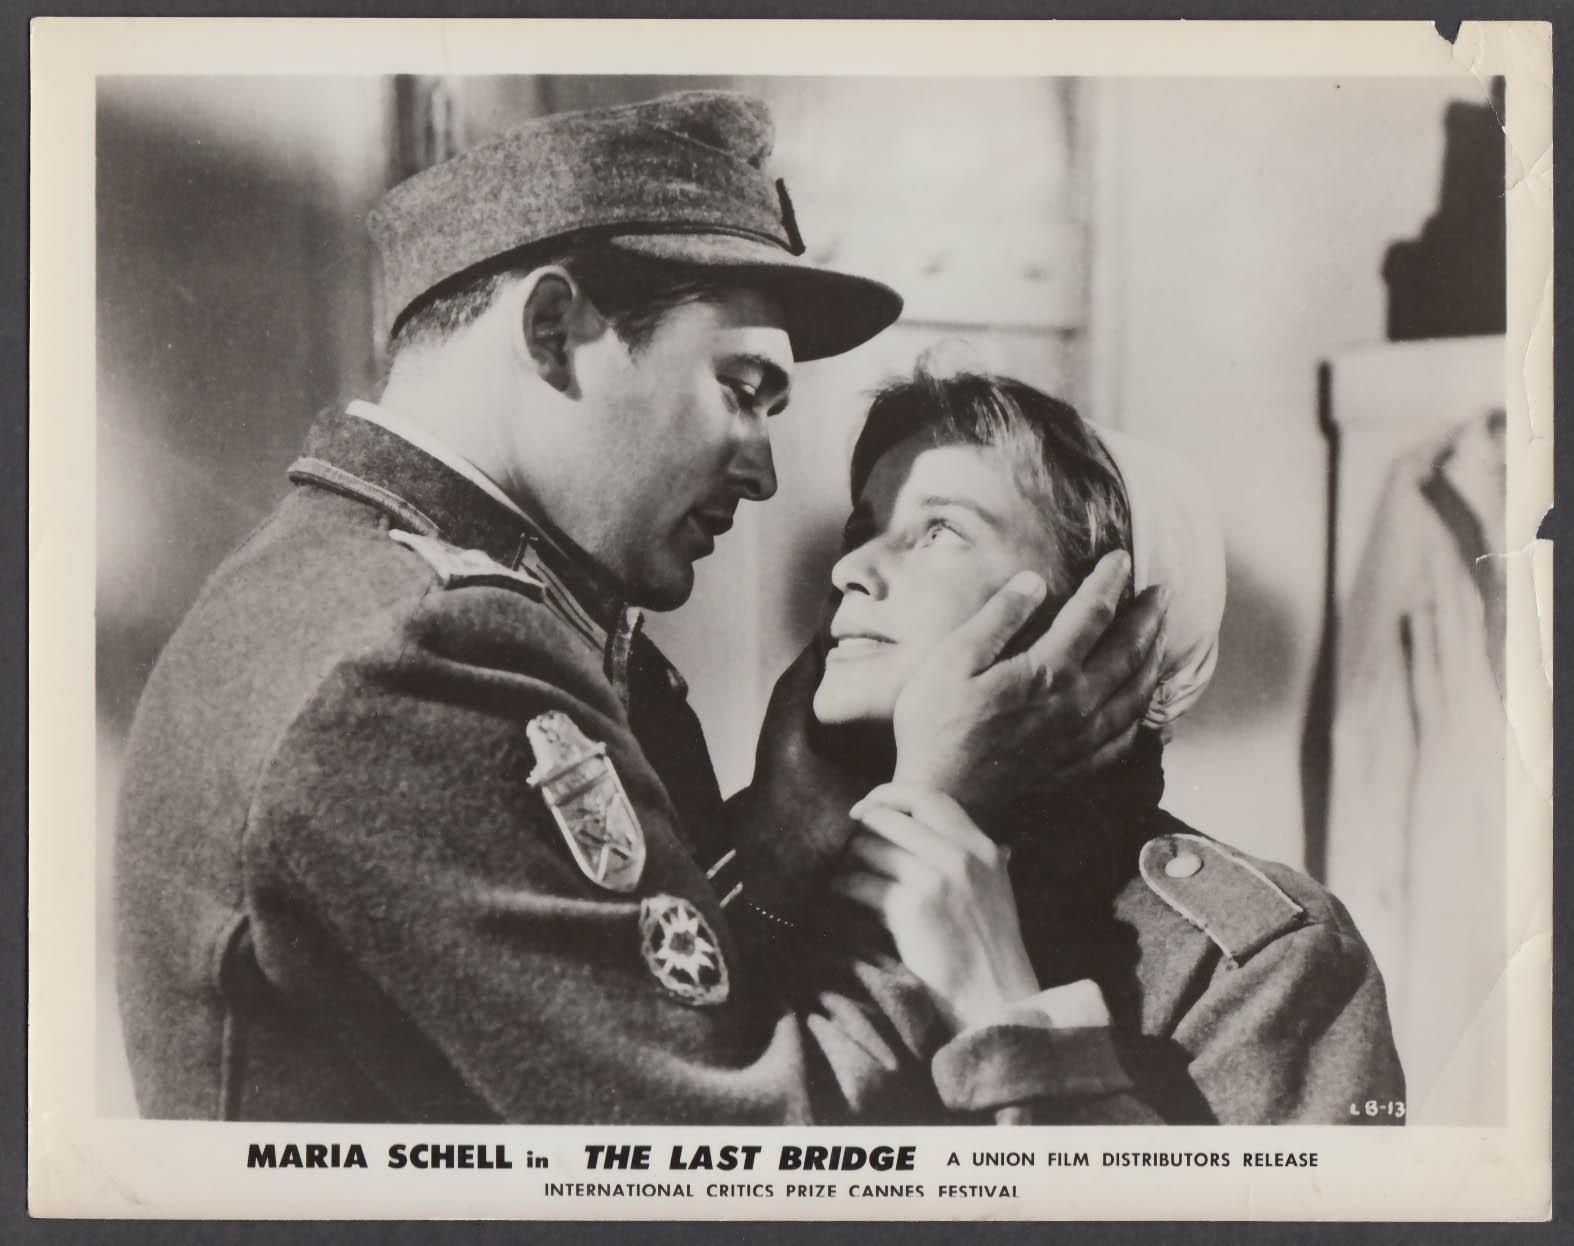 Carl Mohner & Maria Schell in The Last Bridge 8x10 publicity photo 1954